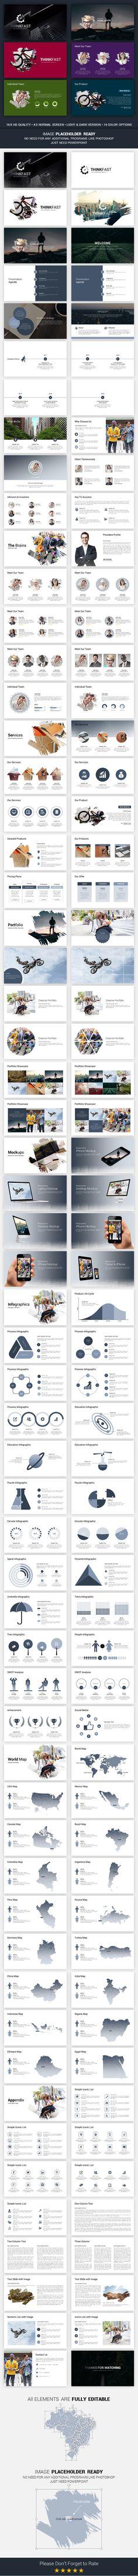 annual agm - multipurpose powerpoint template #design #slides, Agm Presentation Template, Presentation templates